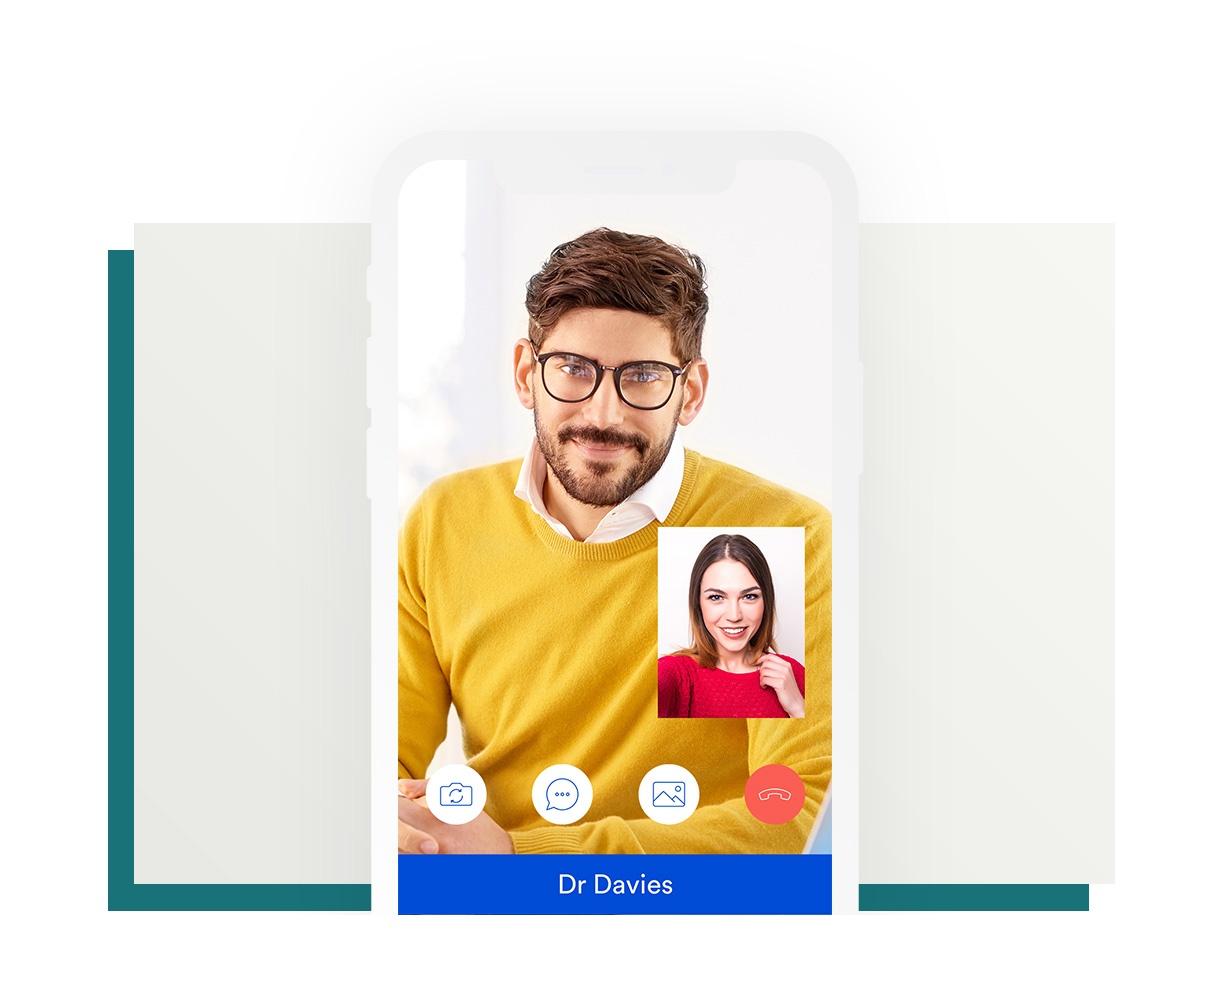 man-facetime-on-phone.jpg